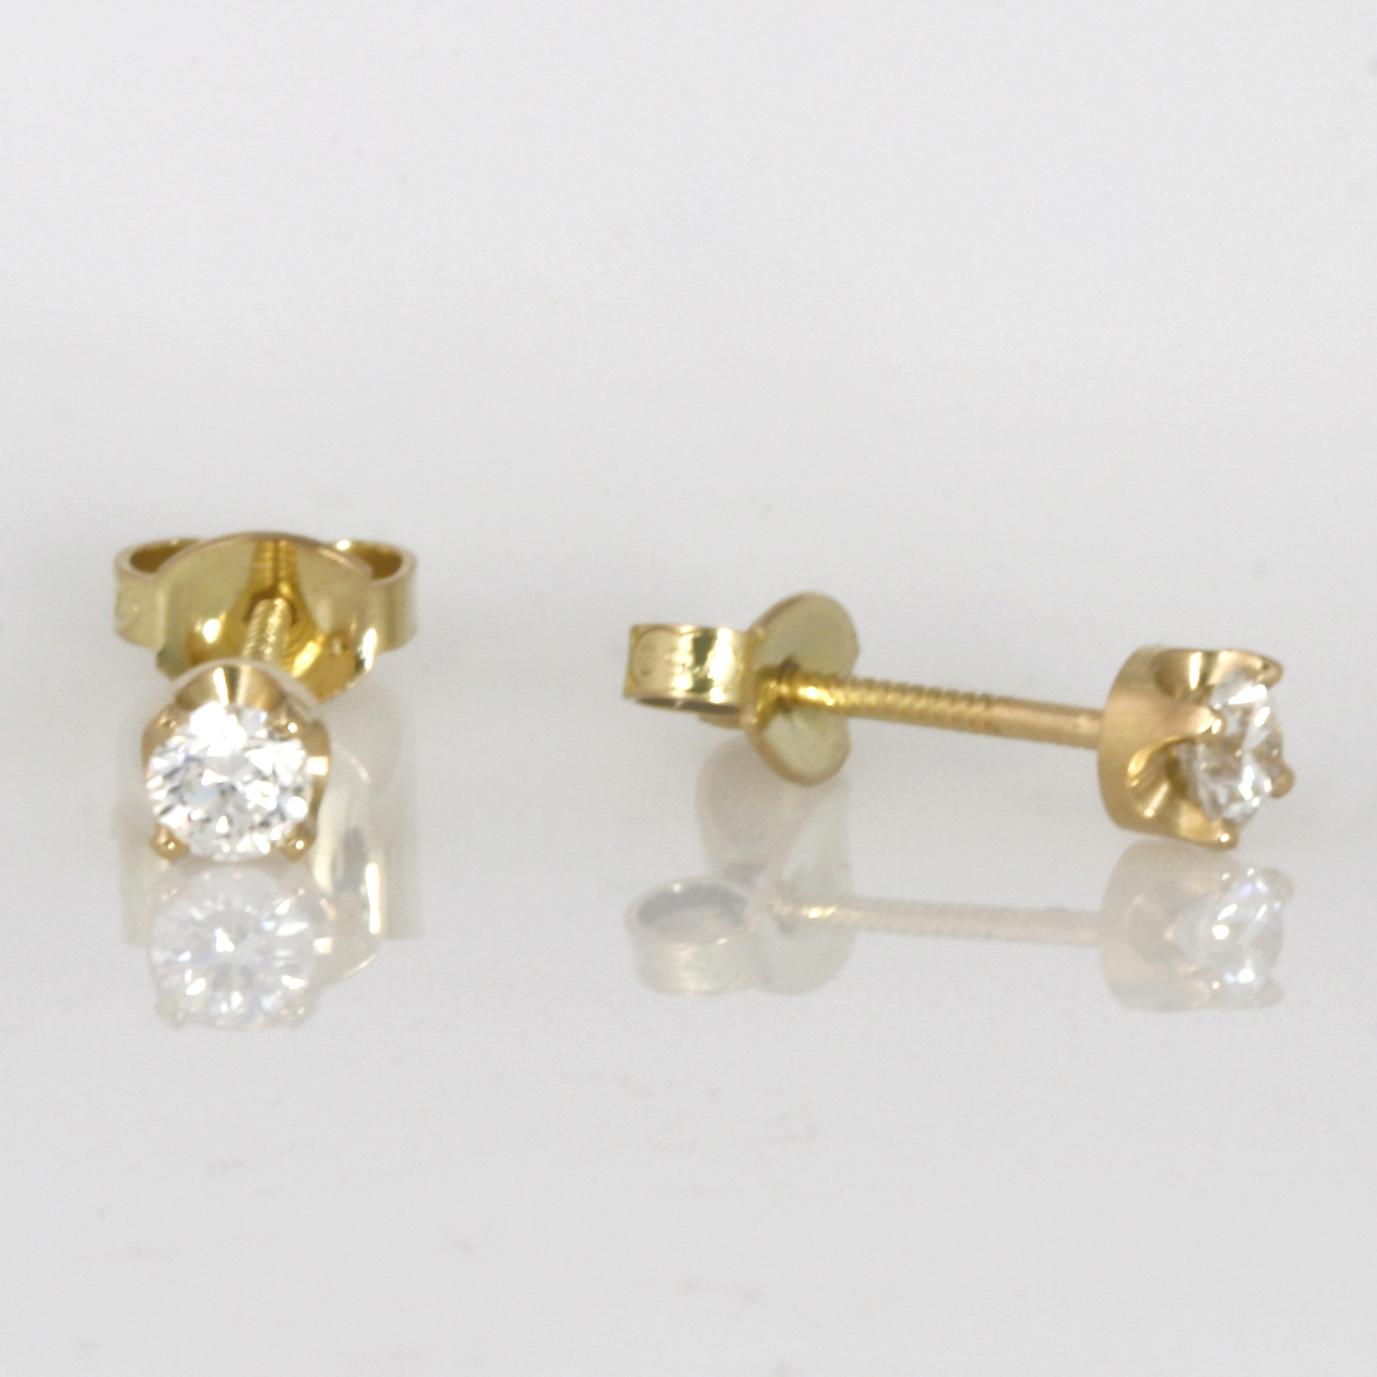 18ct yellow gold diamond threaded stud earrings